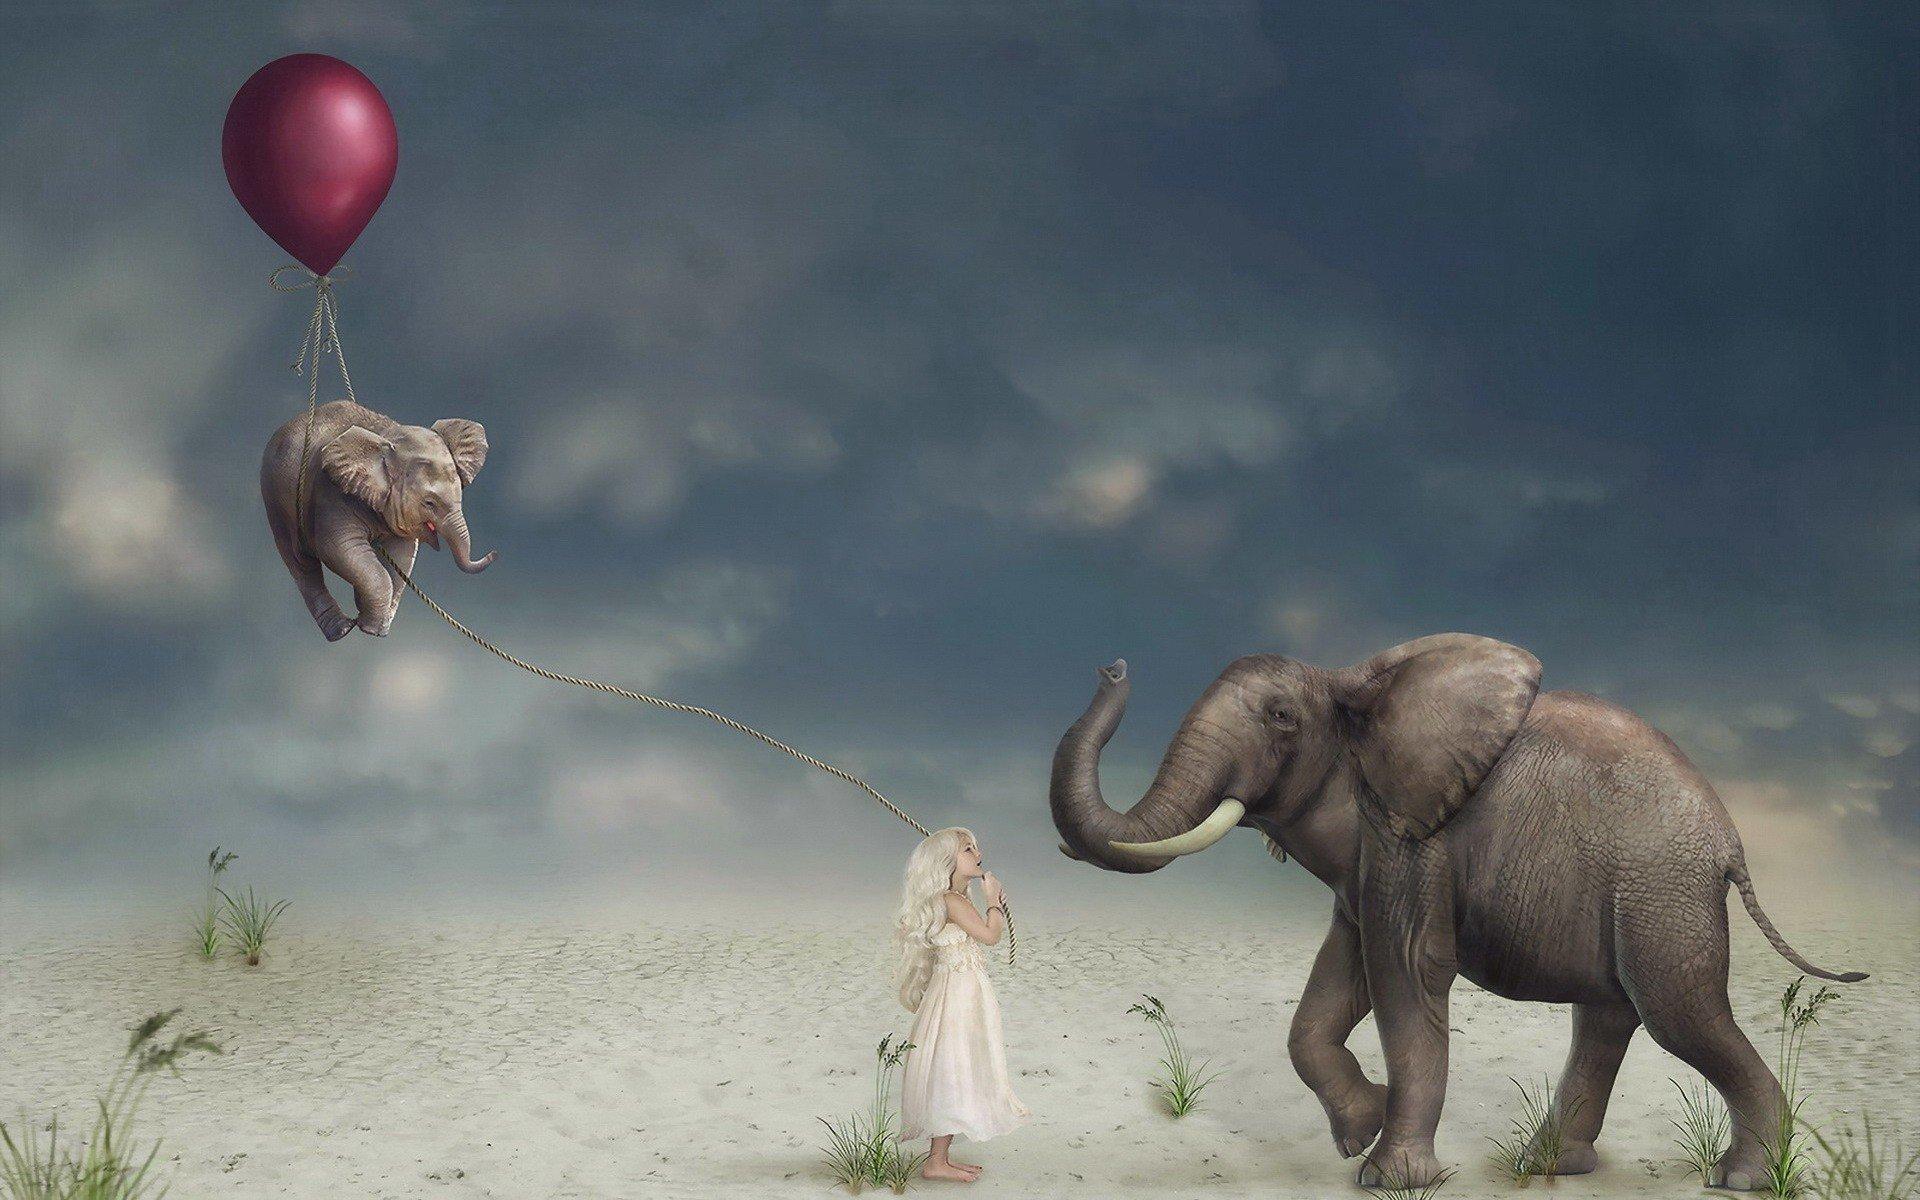 Children artwork balloon elephant animals surreal hd wallpapers desktop and mobile images - Image elephant ...